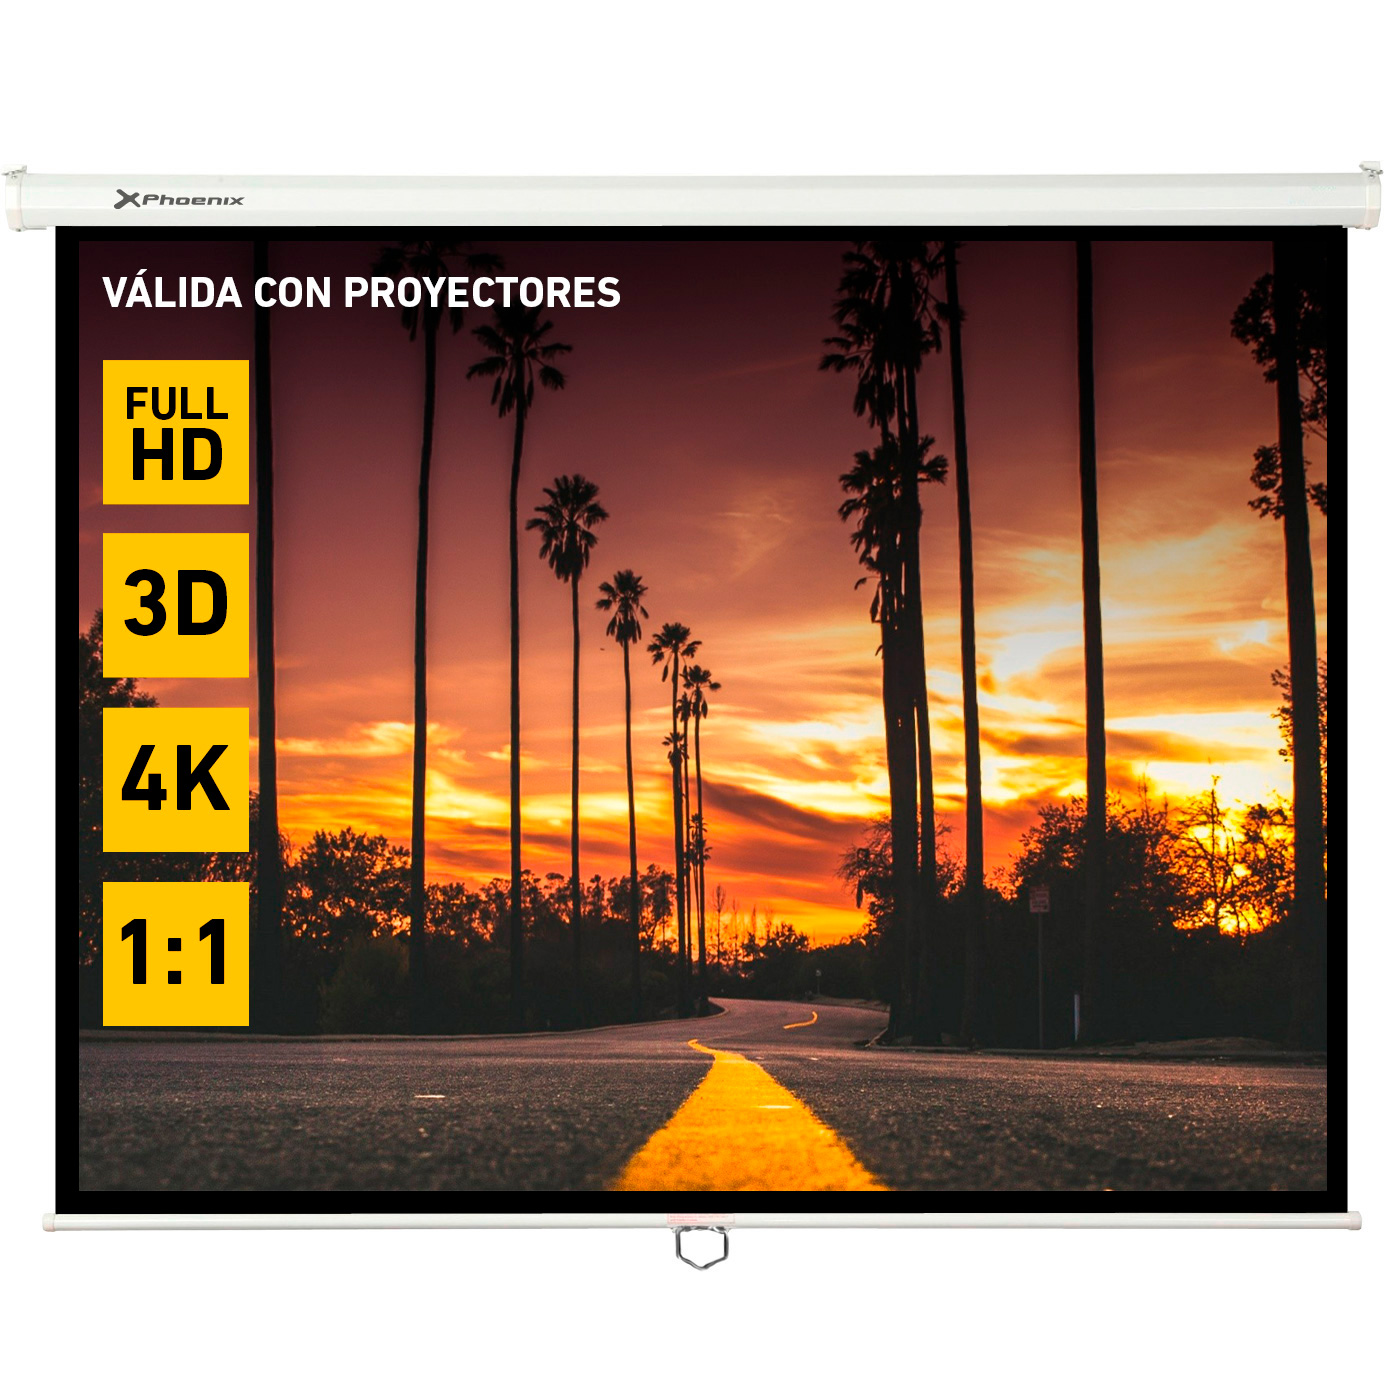 Pantalla Manual Videoproyector Phoenix 169?? 3m X 3m PHPANTALLA-300M